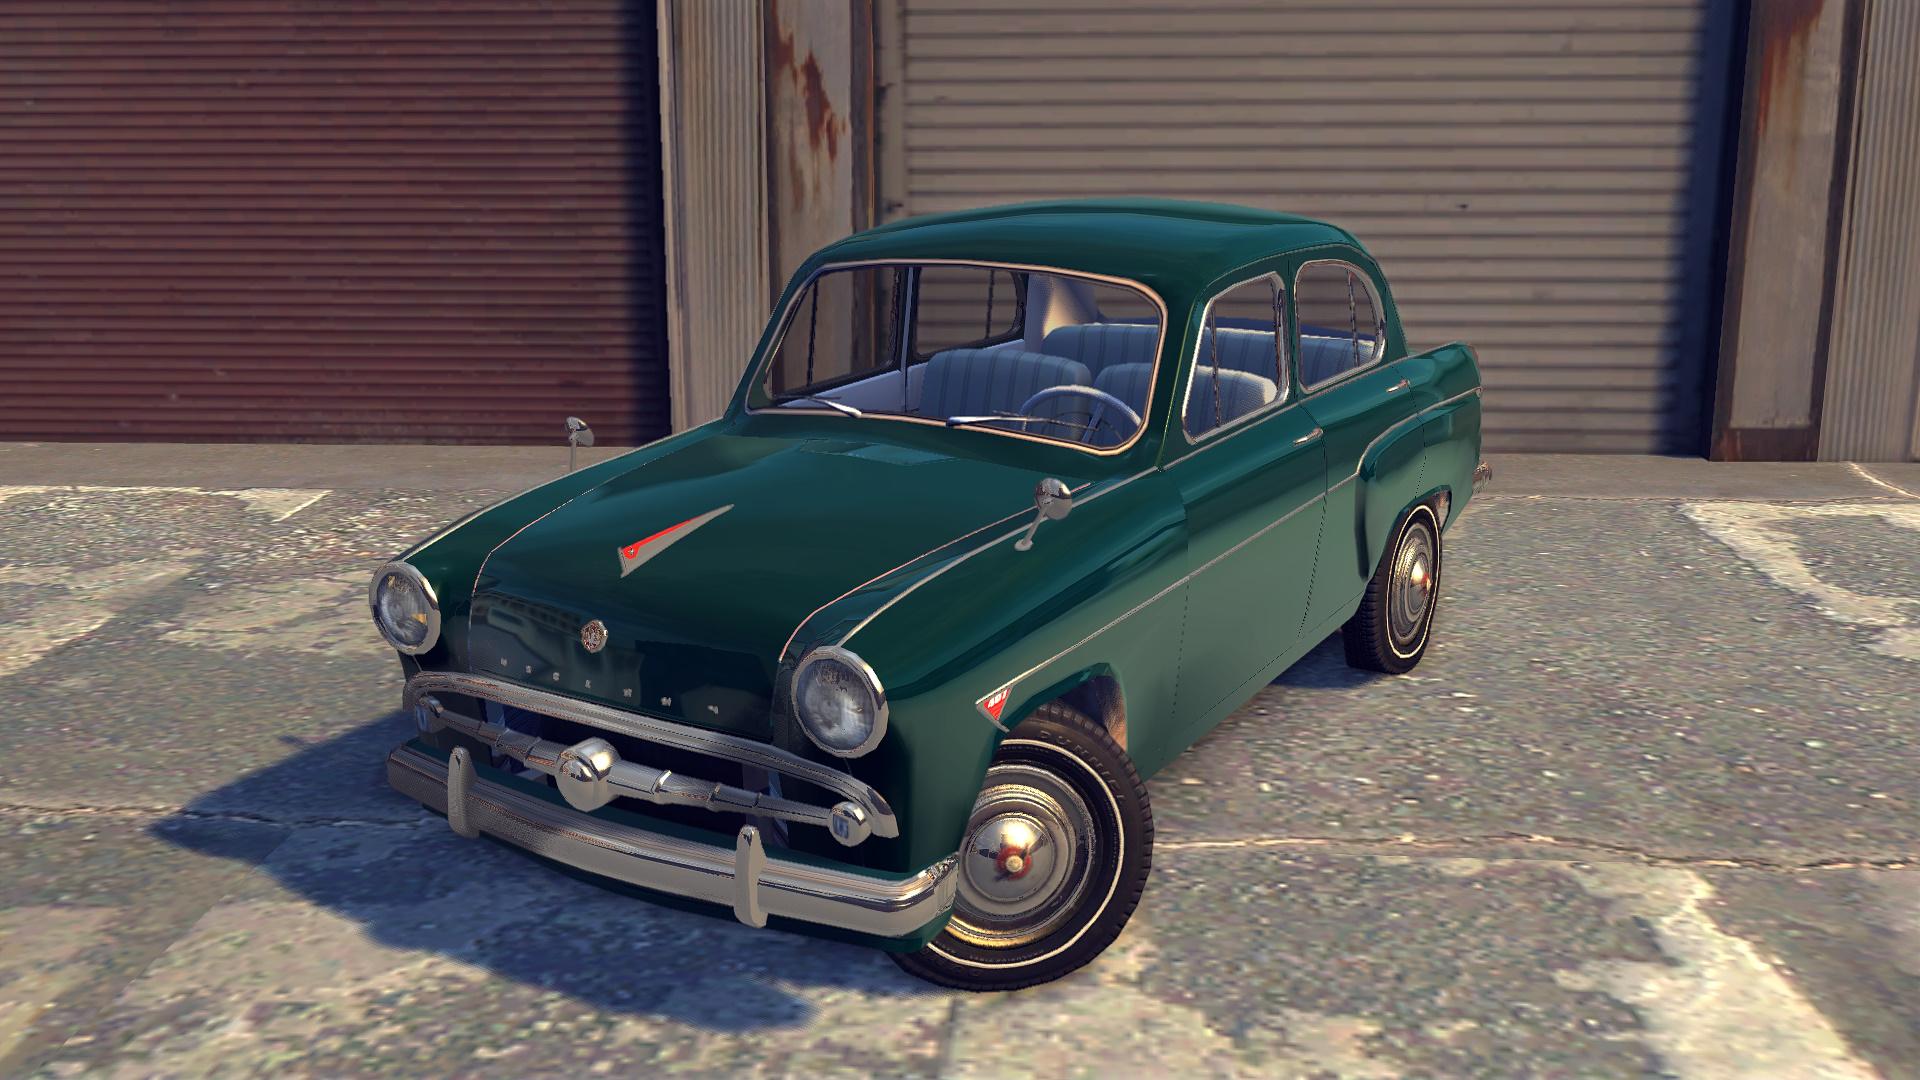 1959 Moskvitch 407